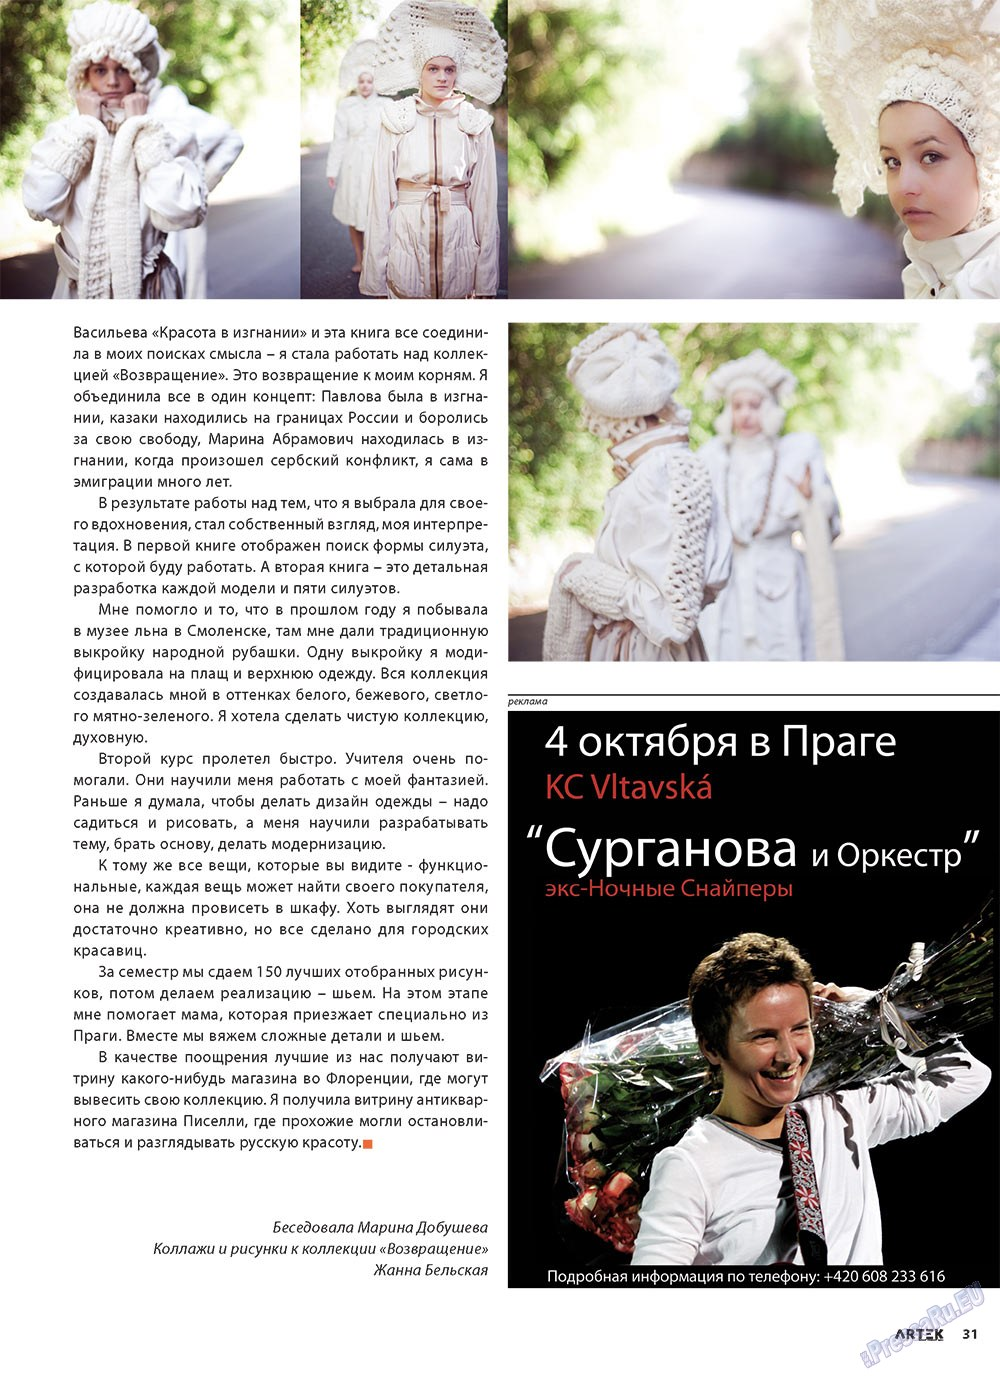 Артек (журнал). 2010 год, номер 4, стр. 33